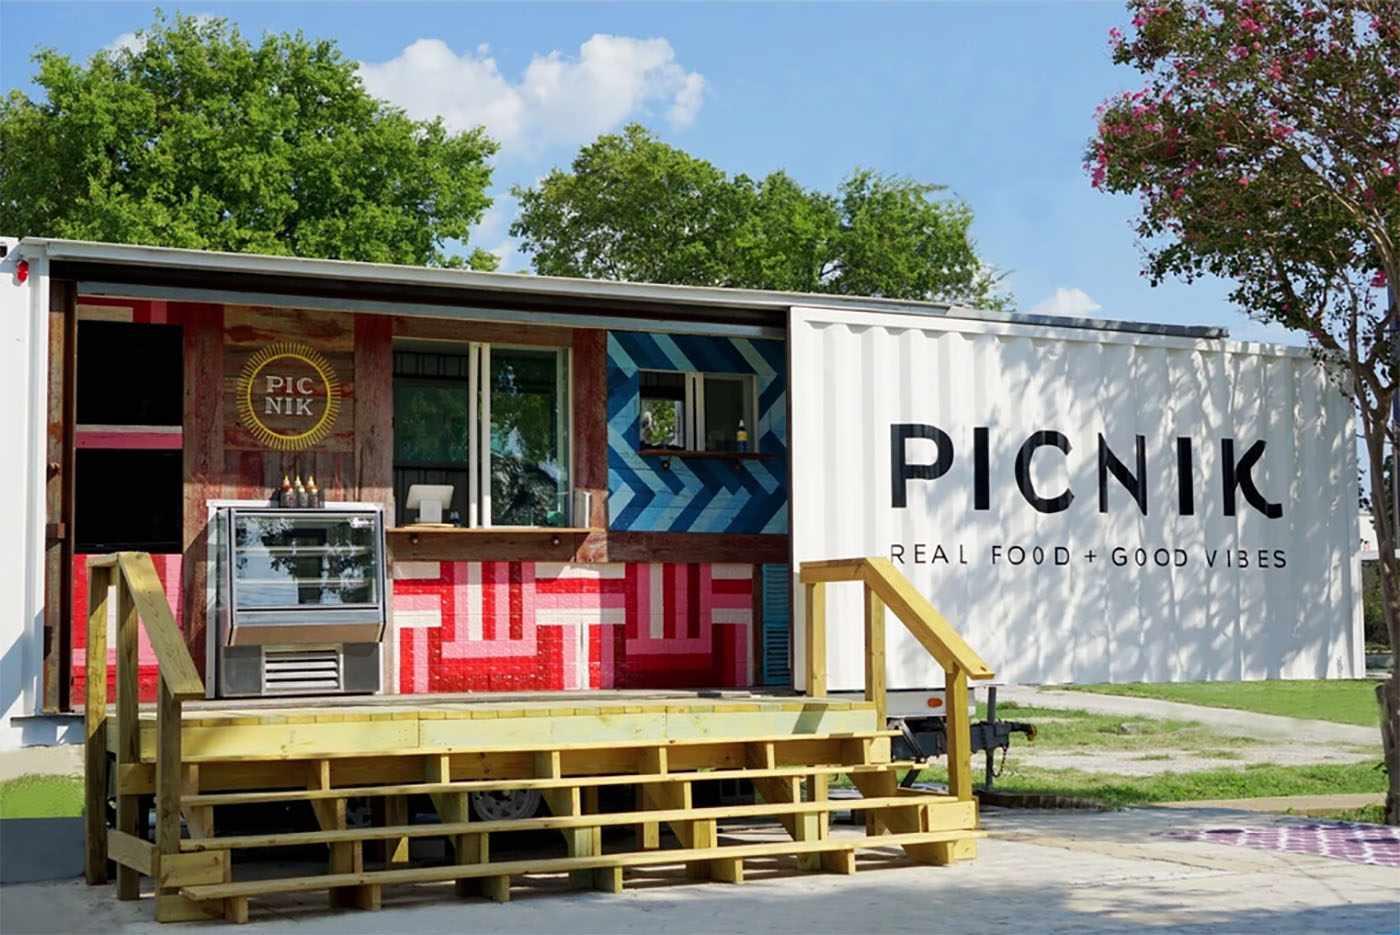 Picnik, part of the St. Elmo Public Market Food Trucks